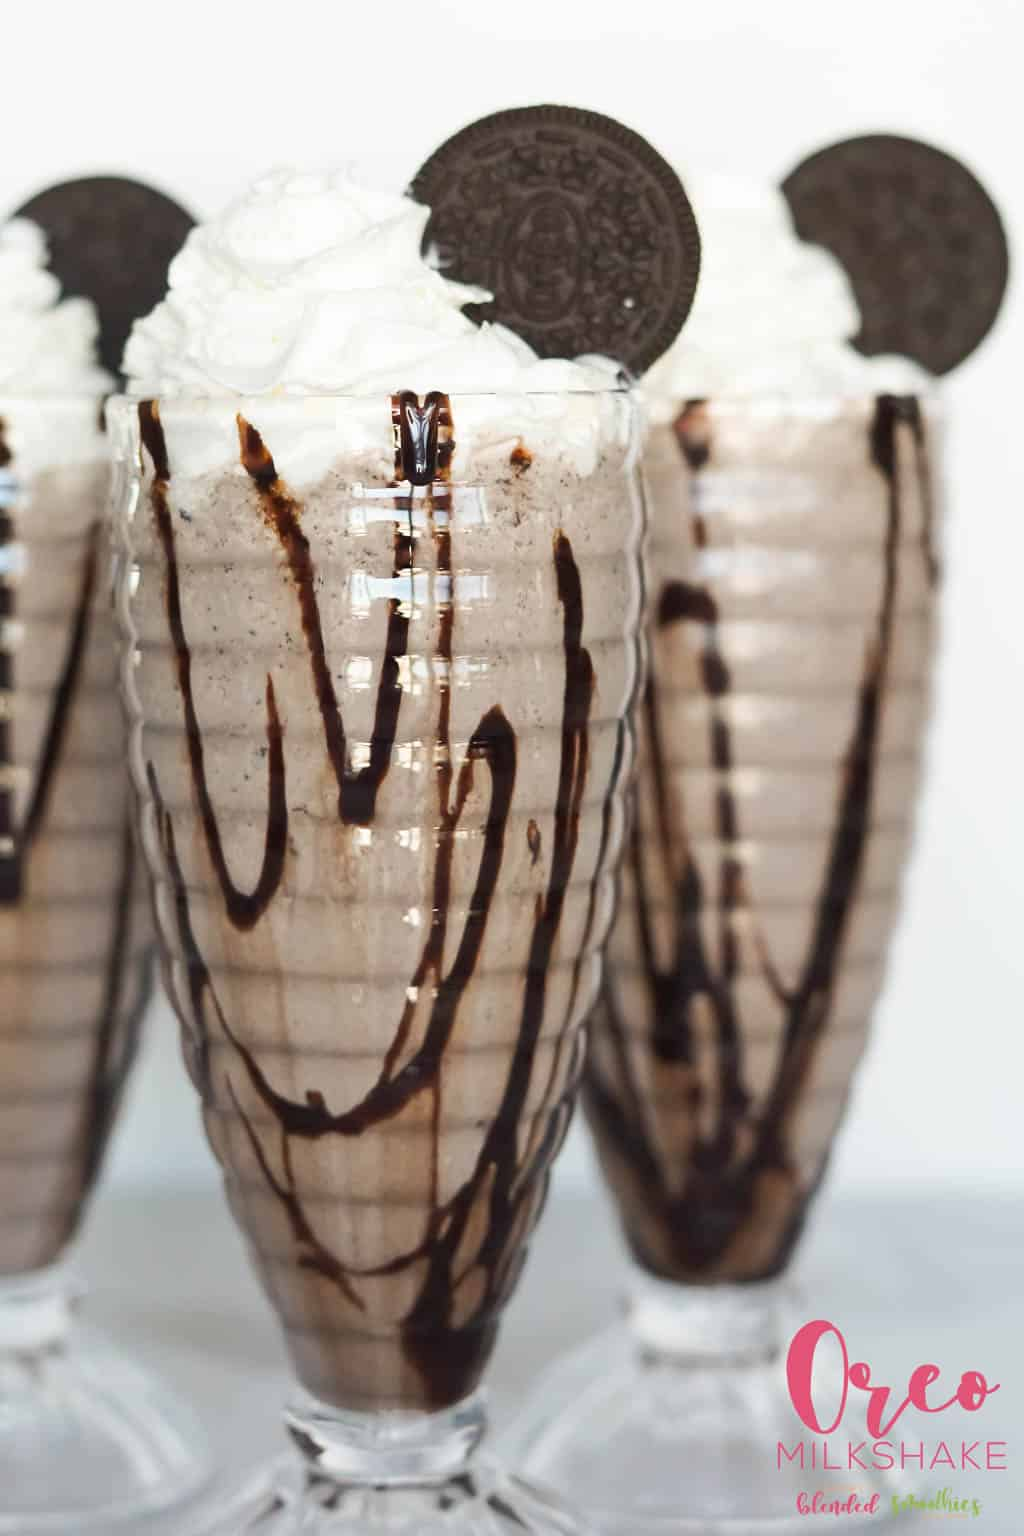 Delicious oreo milkshake